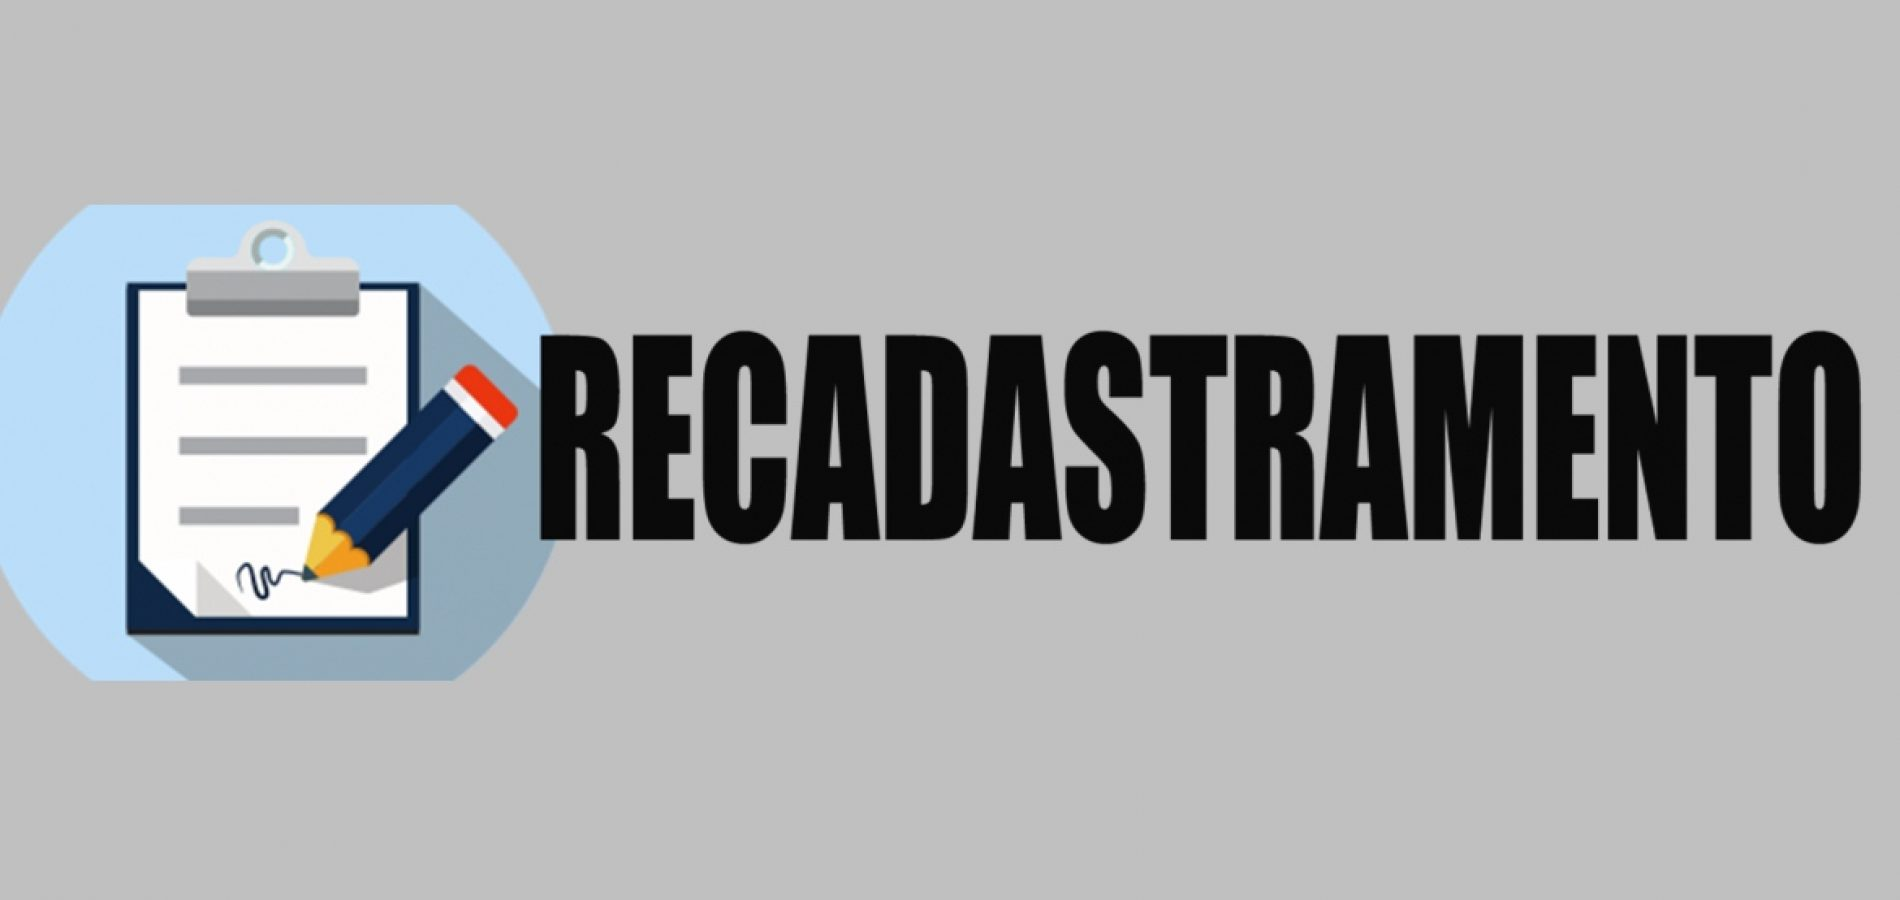 Prefeitura de Itainópolis inicia recadastramento de servidores